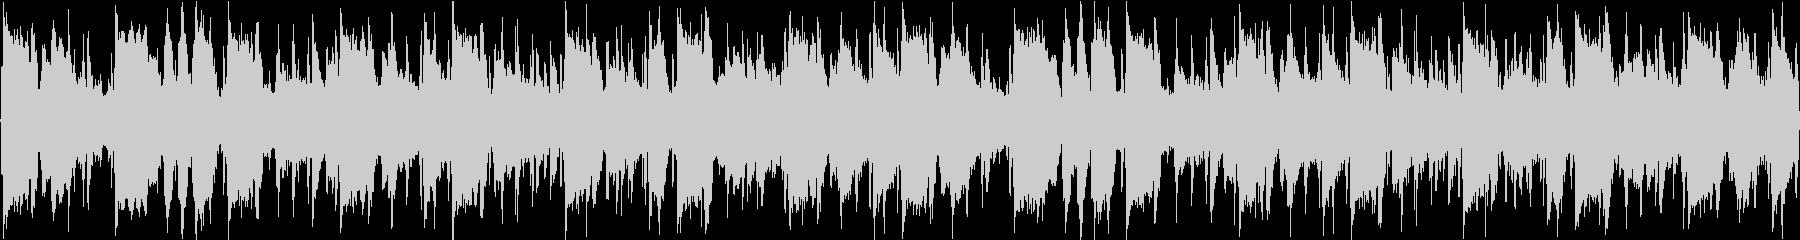 AcidJazz レトロな雰囲気の曲の未再生の波形